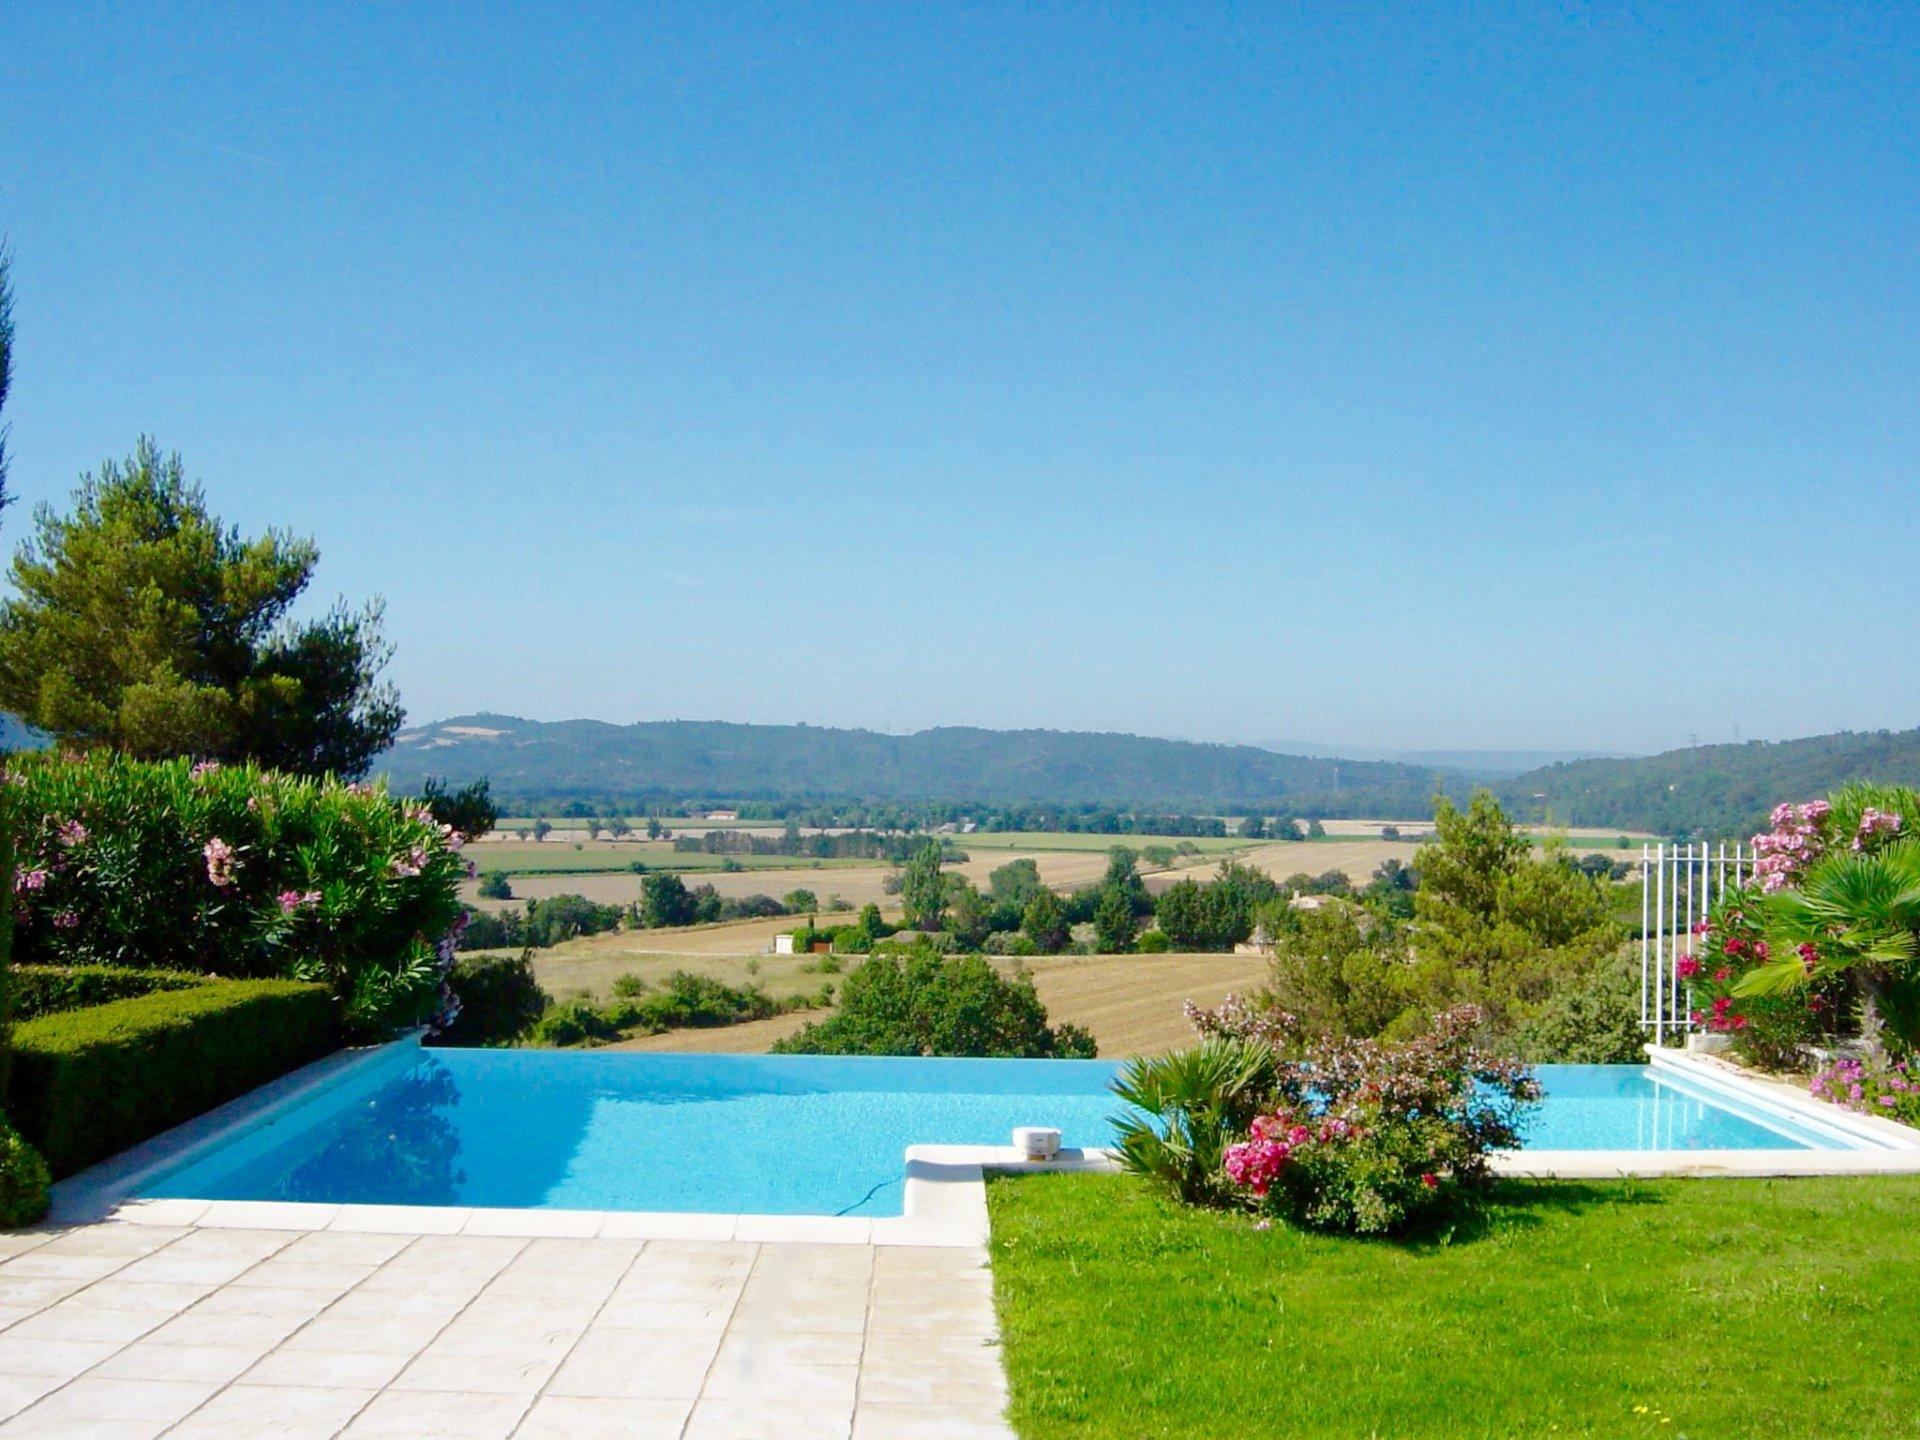 Delicieux Greoux Les Bains Location Villa Luxe Provence Avec Piscine Privee ...